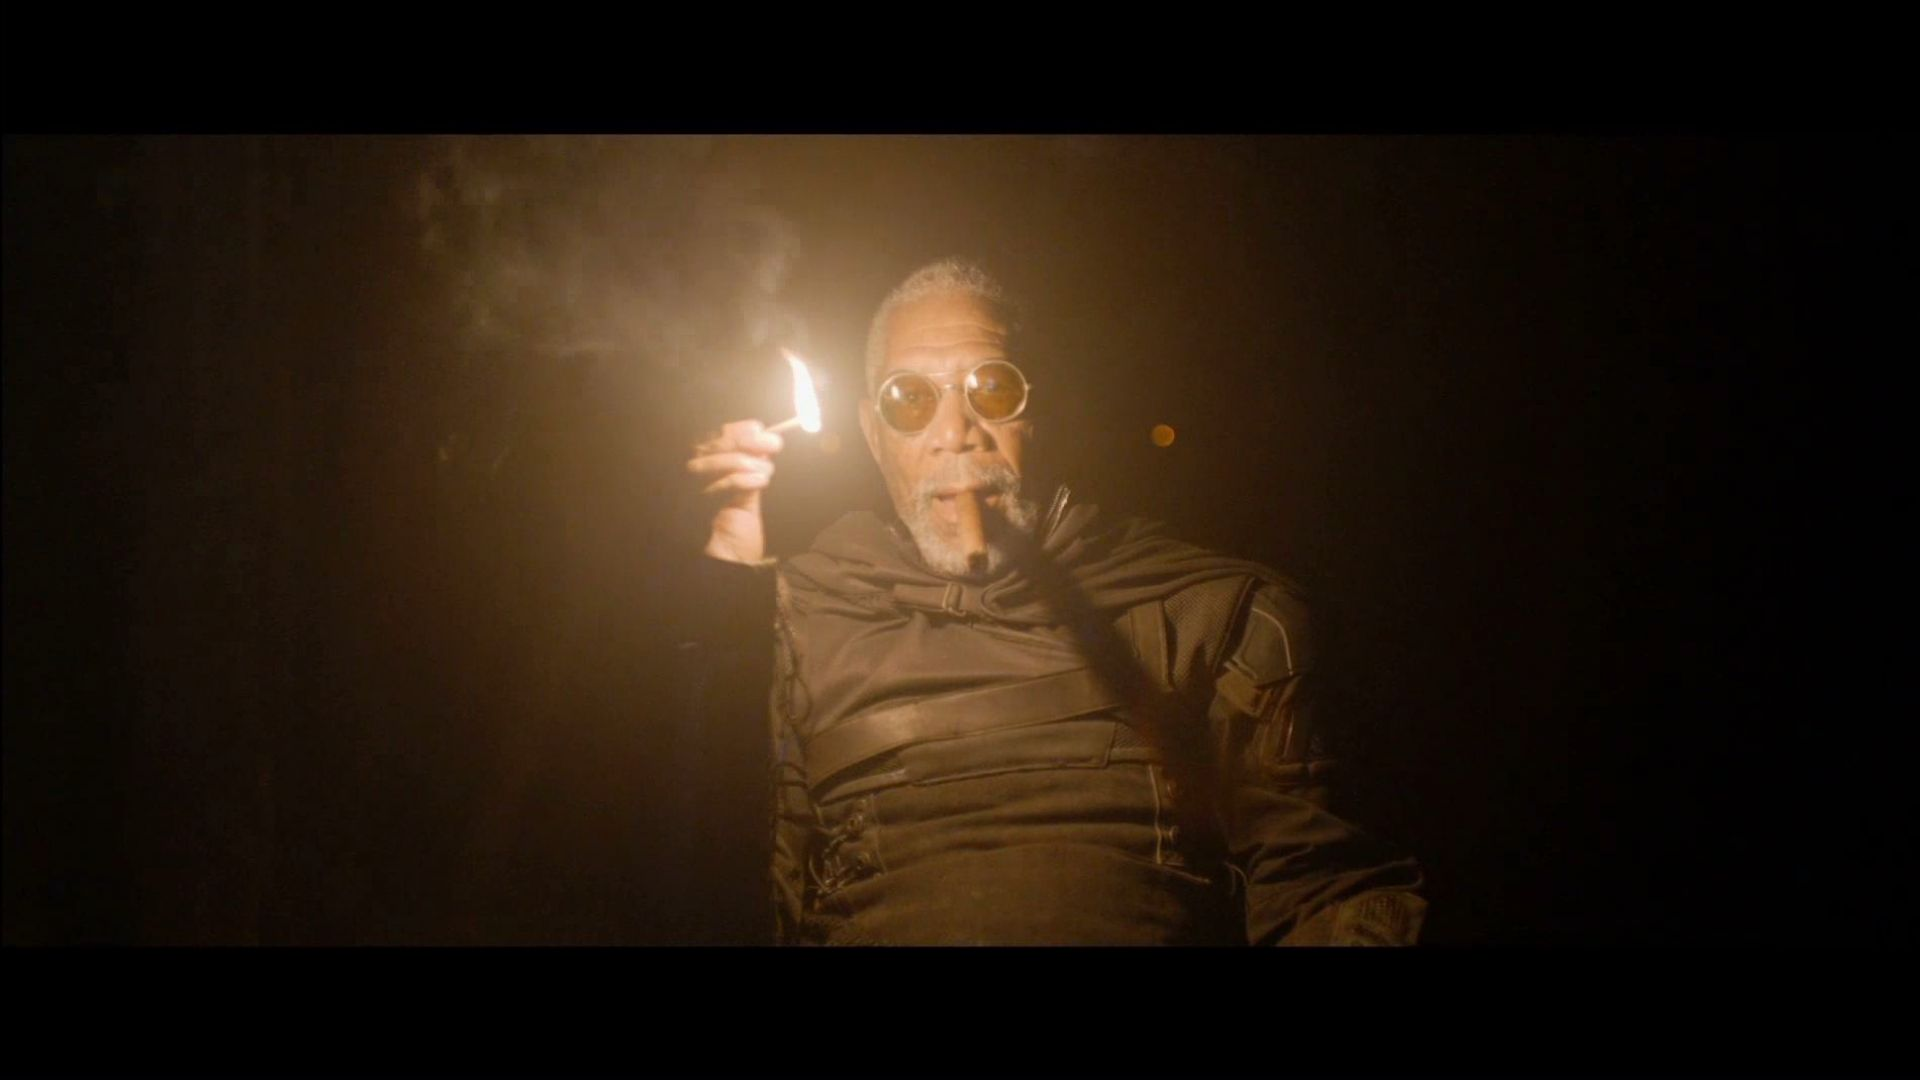 Morgan Freeman lights a match and interrogates Tom Cruise in Oblivion